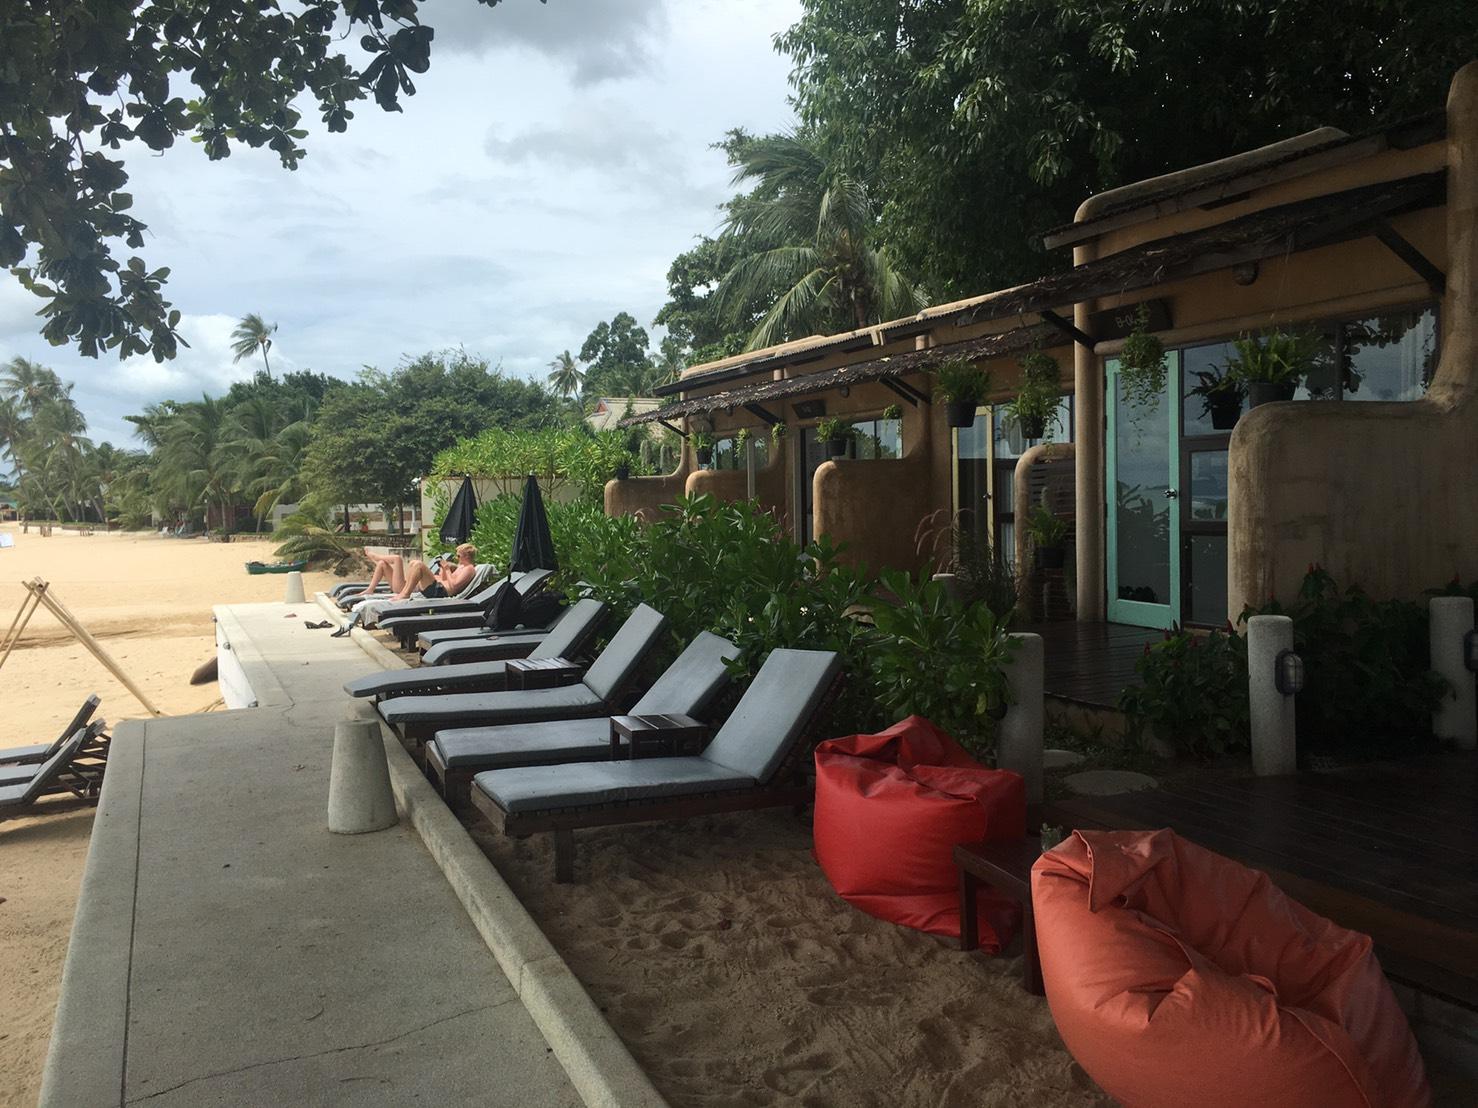 beachfront                                                                                        8583             2        samui                            pantip  rh   pantip